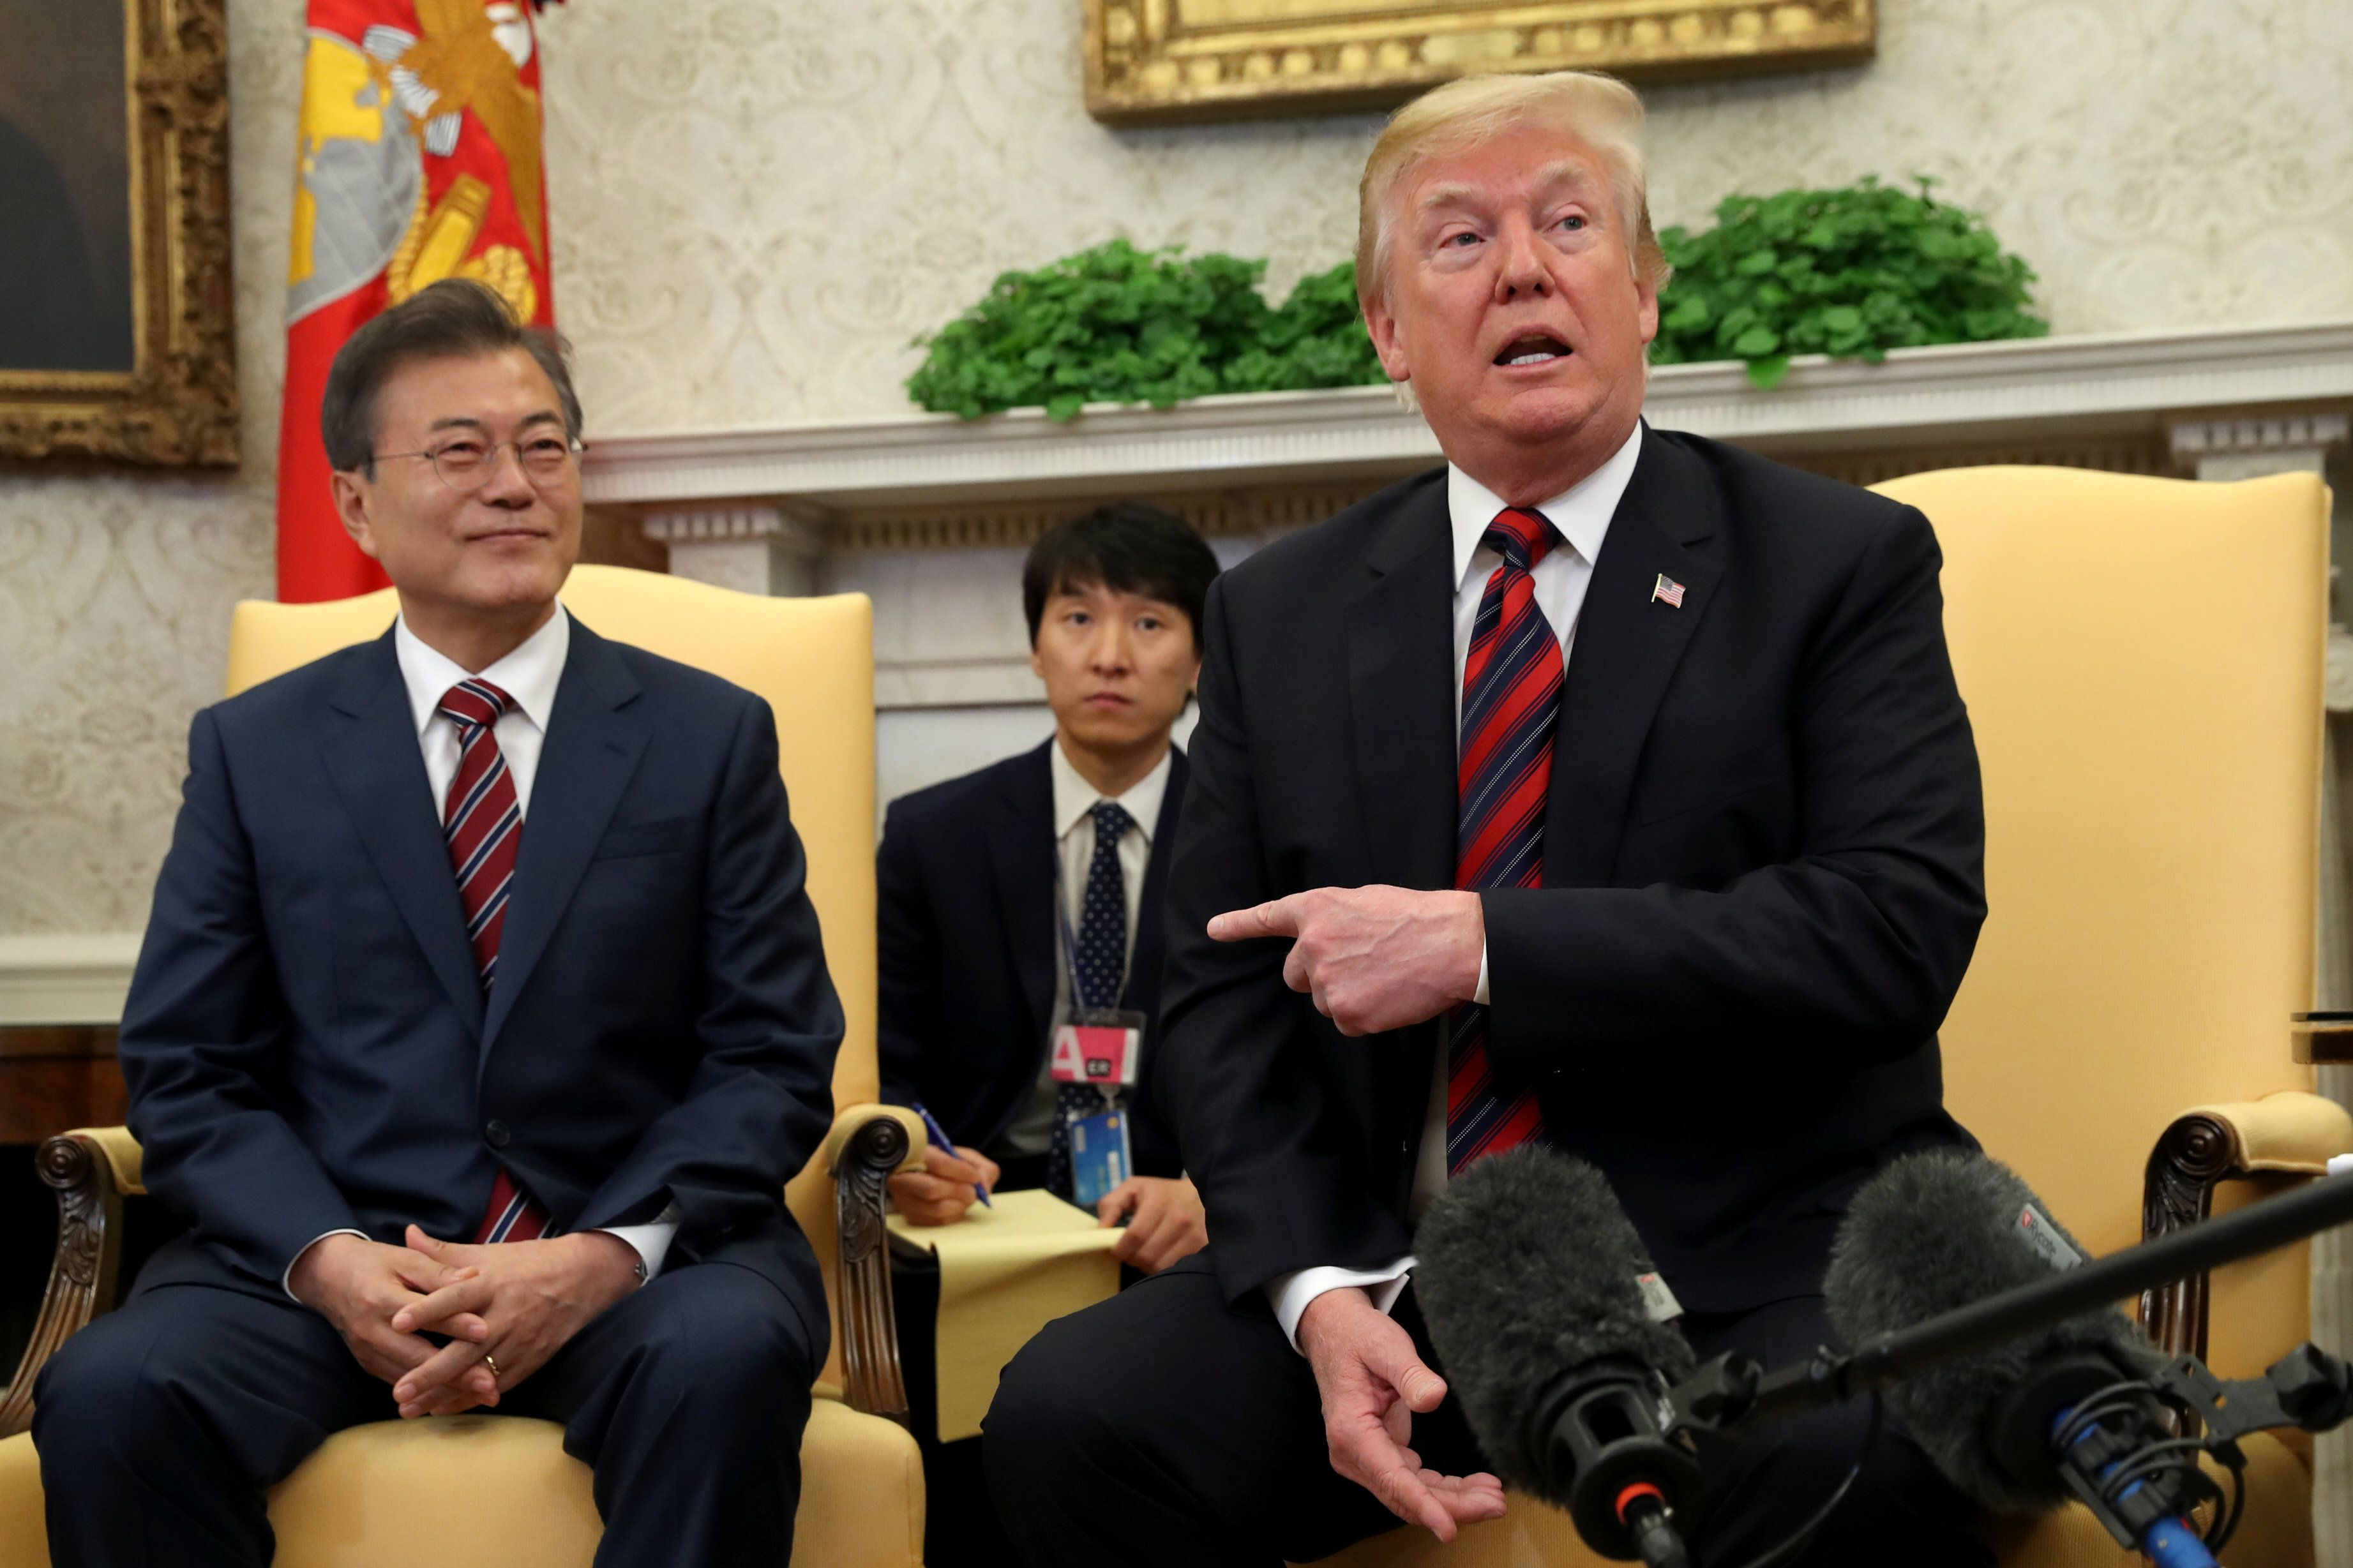 South Korea Responds To Trump's Sudden Cancelation Of Kim Jong Un